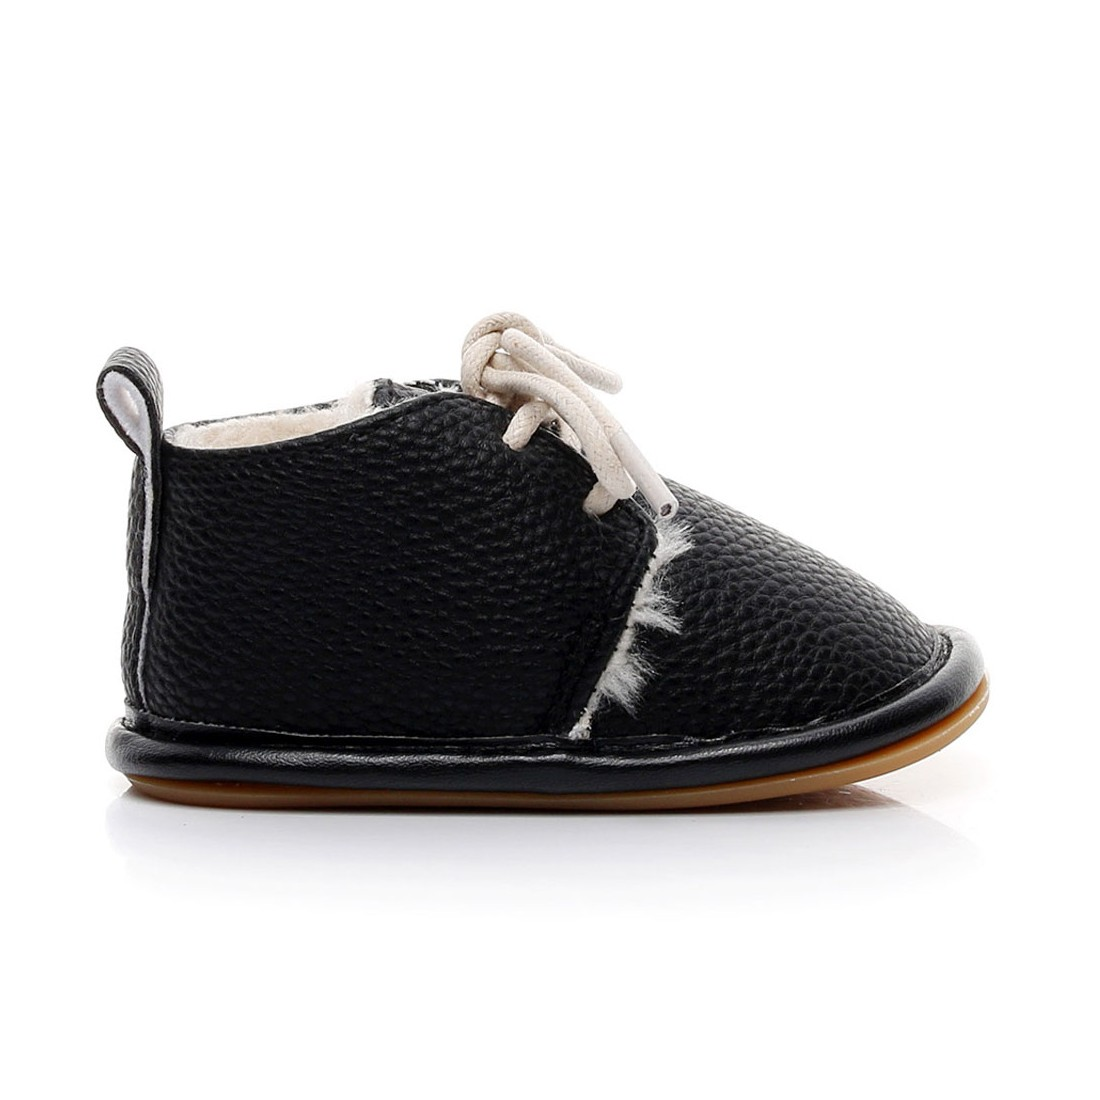 Parker Luxury Black Baby Shoe